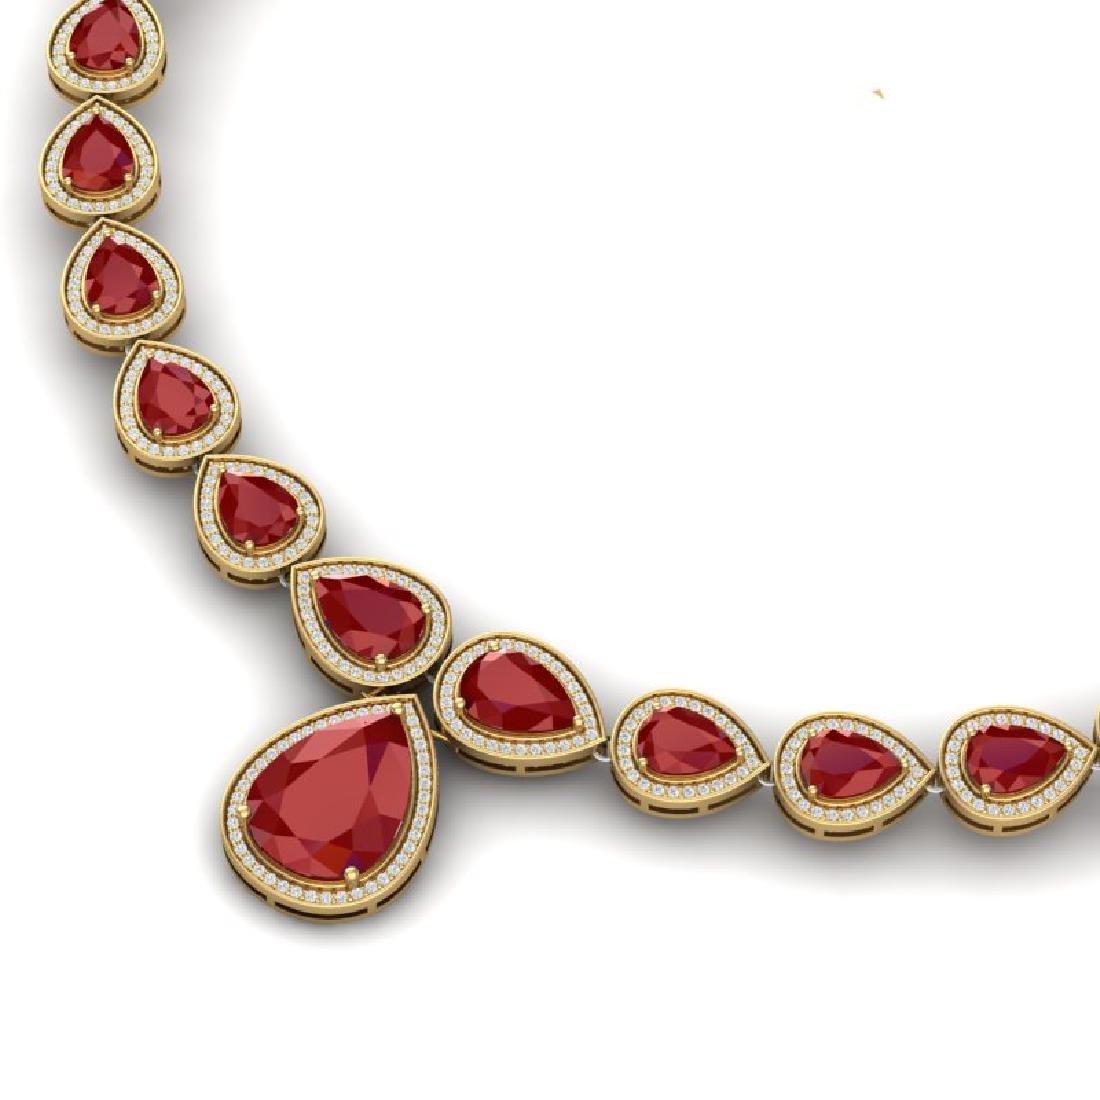 51.41 CTW Royalty Ruby & VS Diamond Necklace 18K Yellow - 2